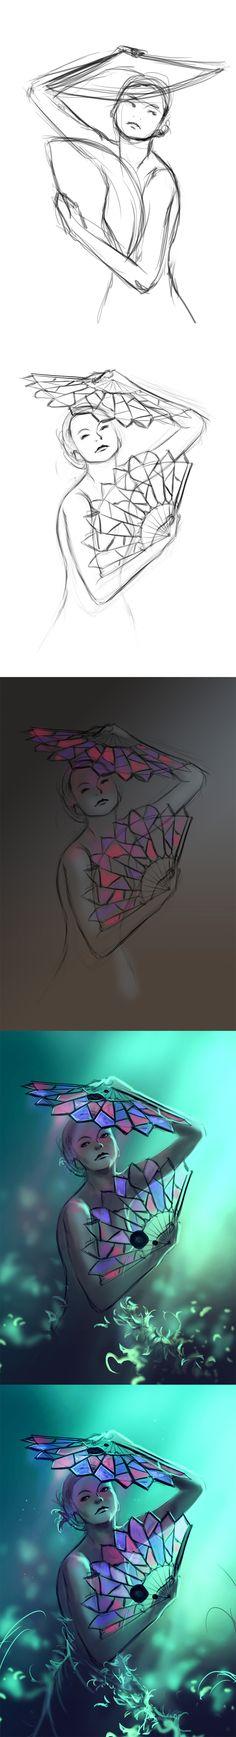 WIP of Butterfly by AquaSixio.deviantart.com on @deviantART